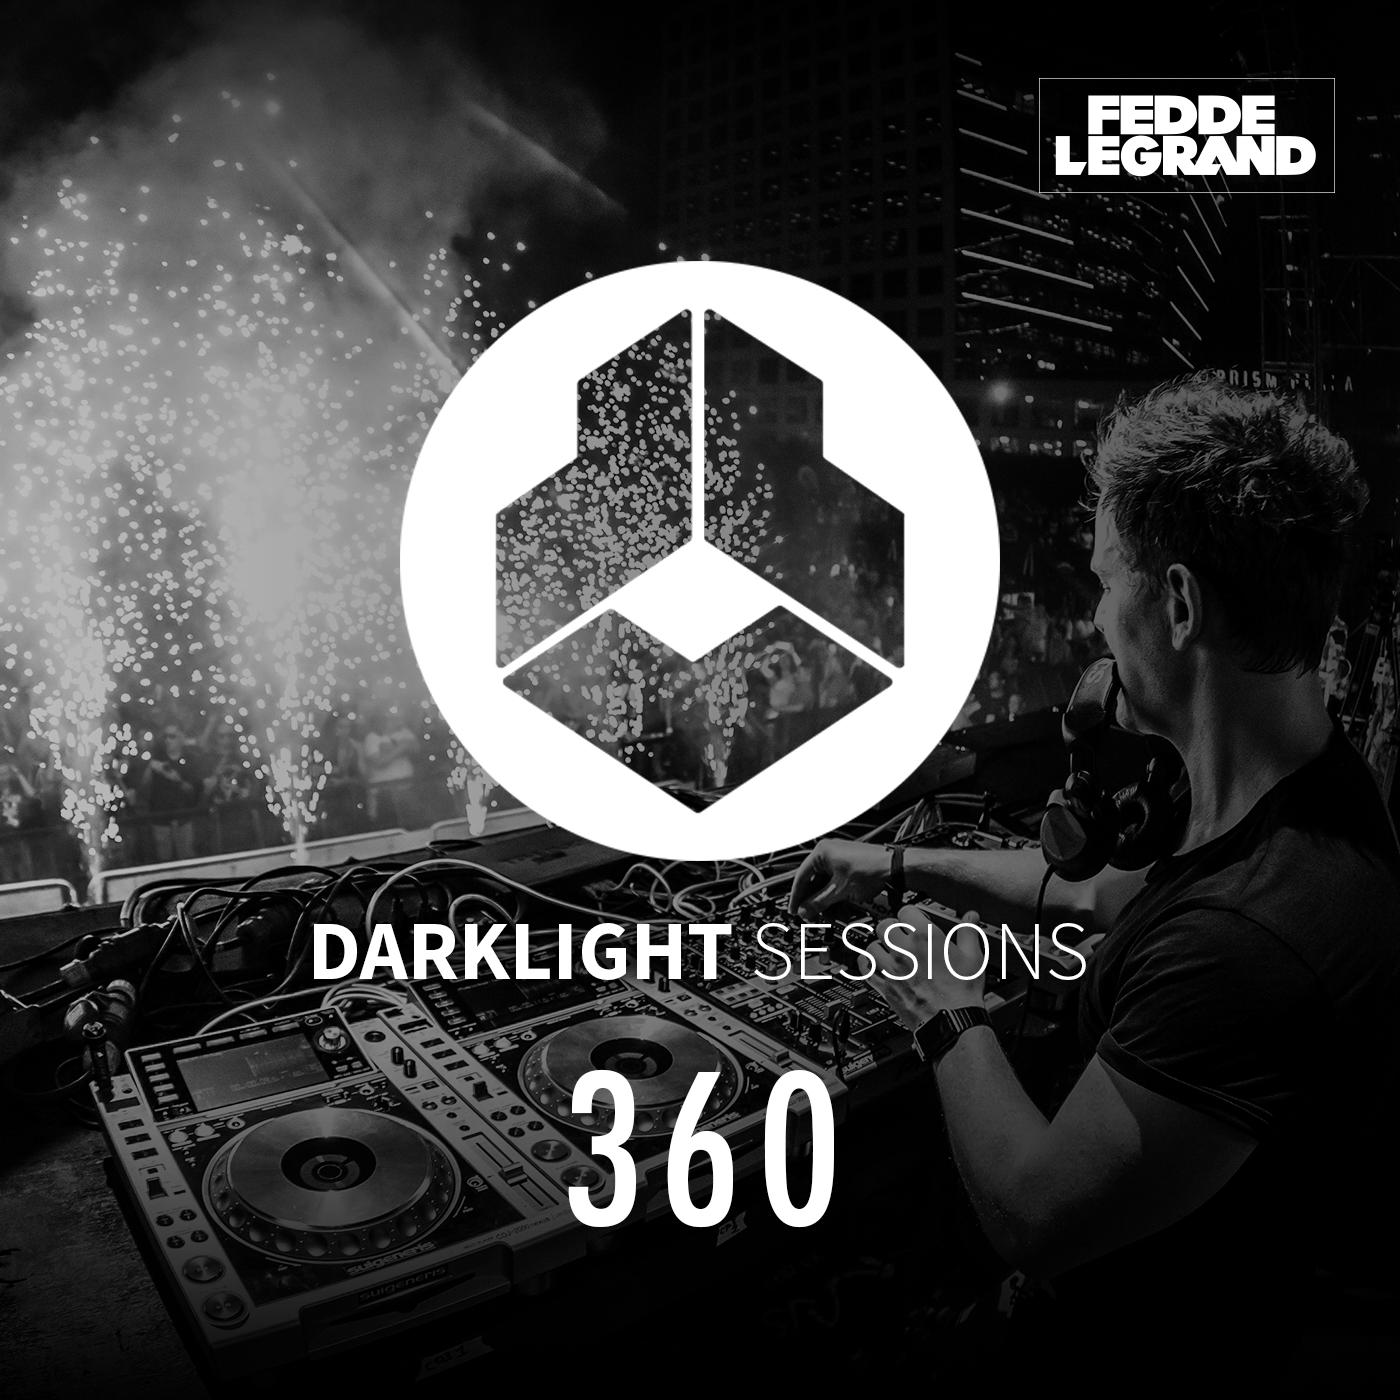 Darklight Sessions 360   Fedde Le Grand - Darklight Sessions on acast